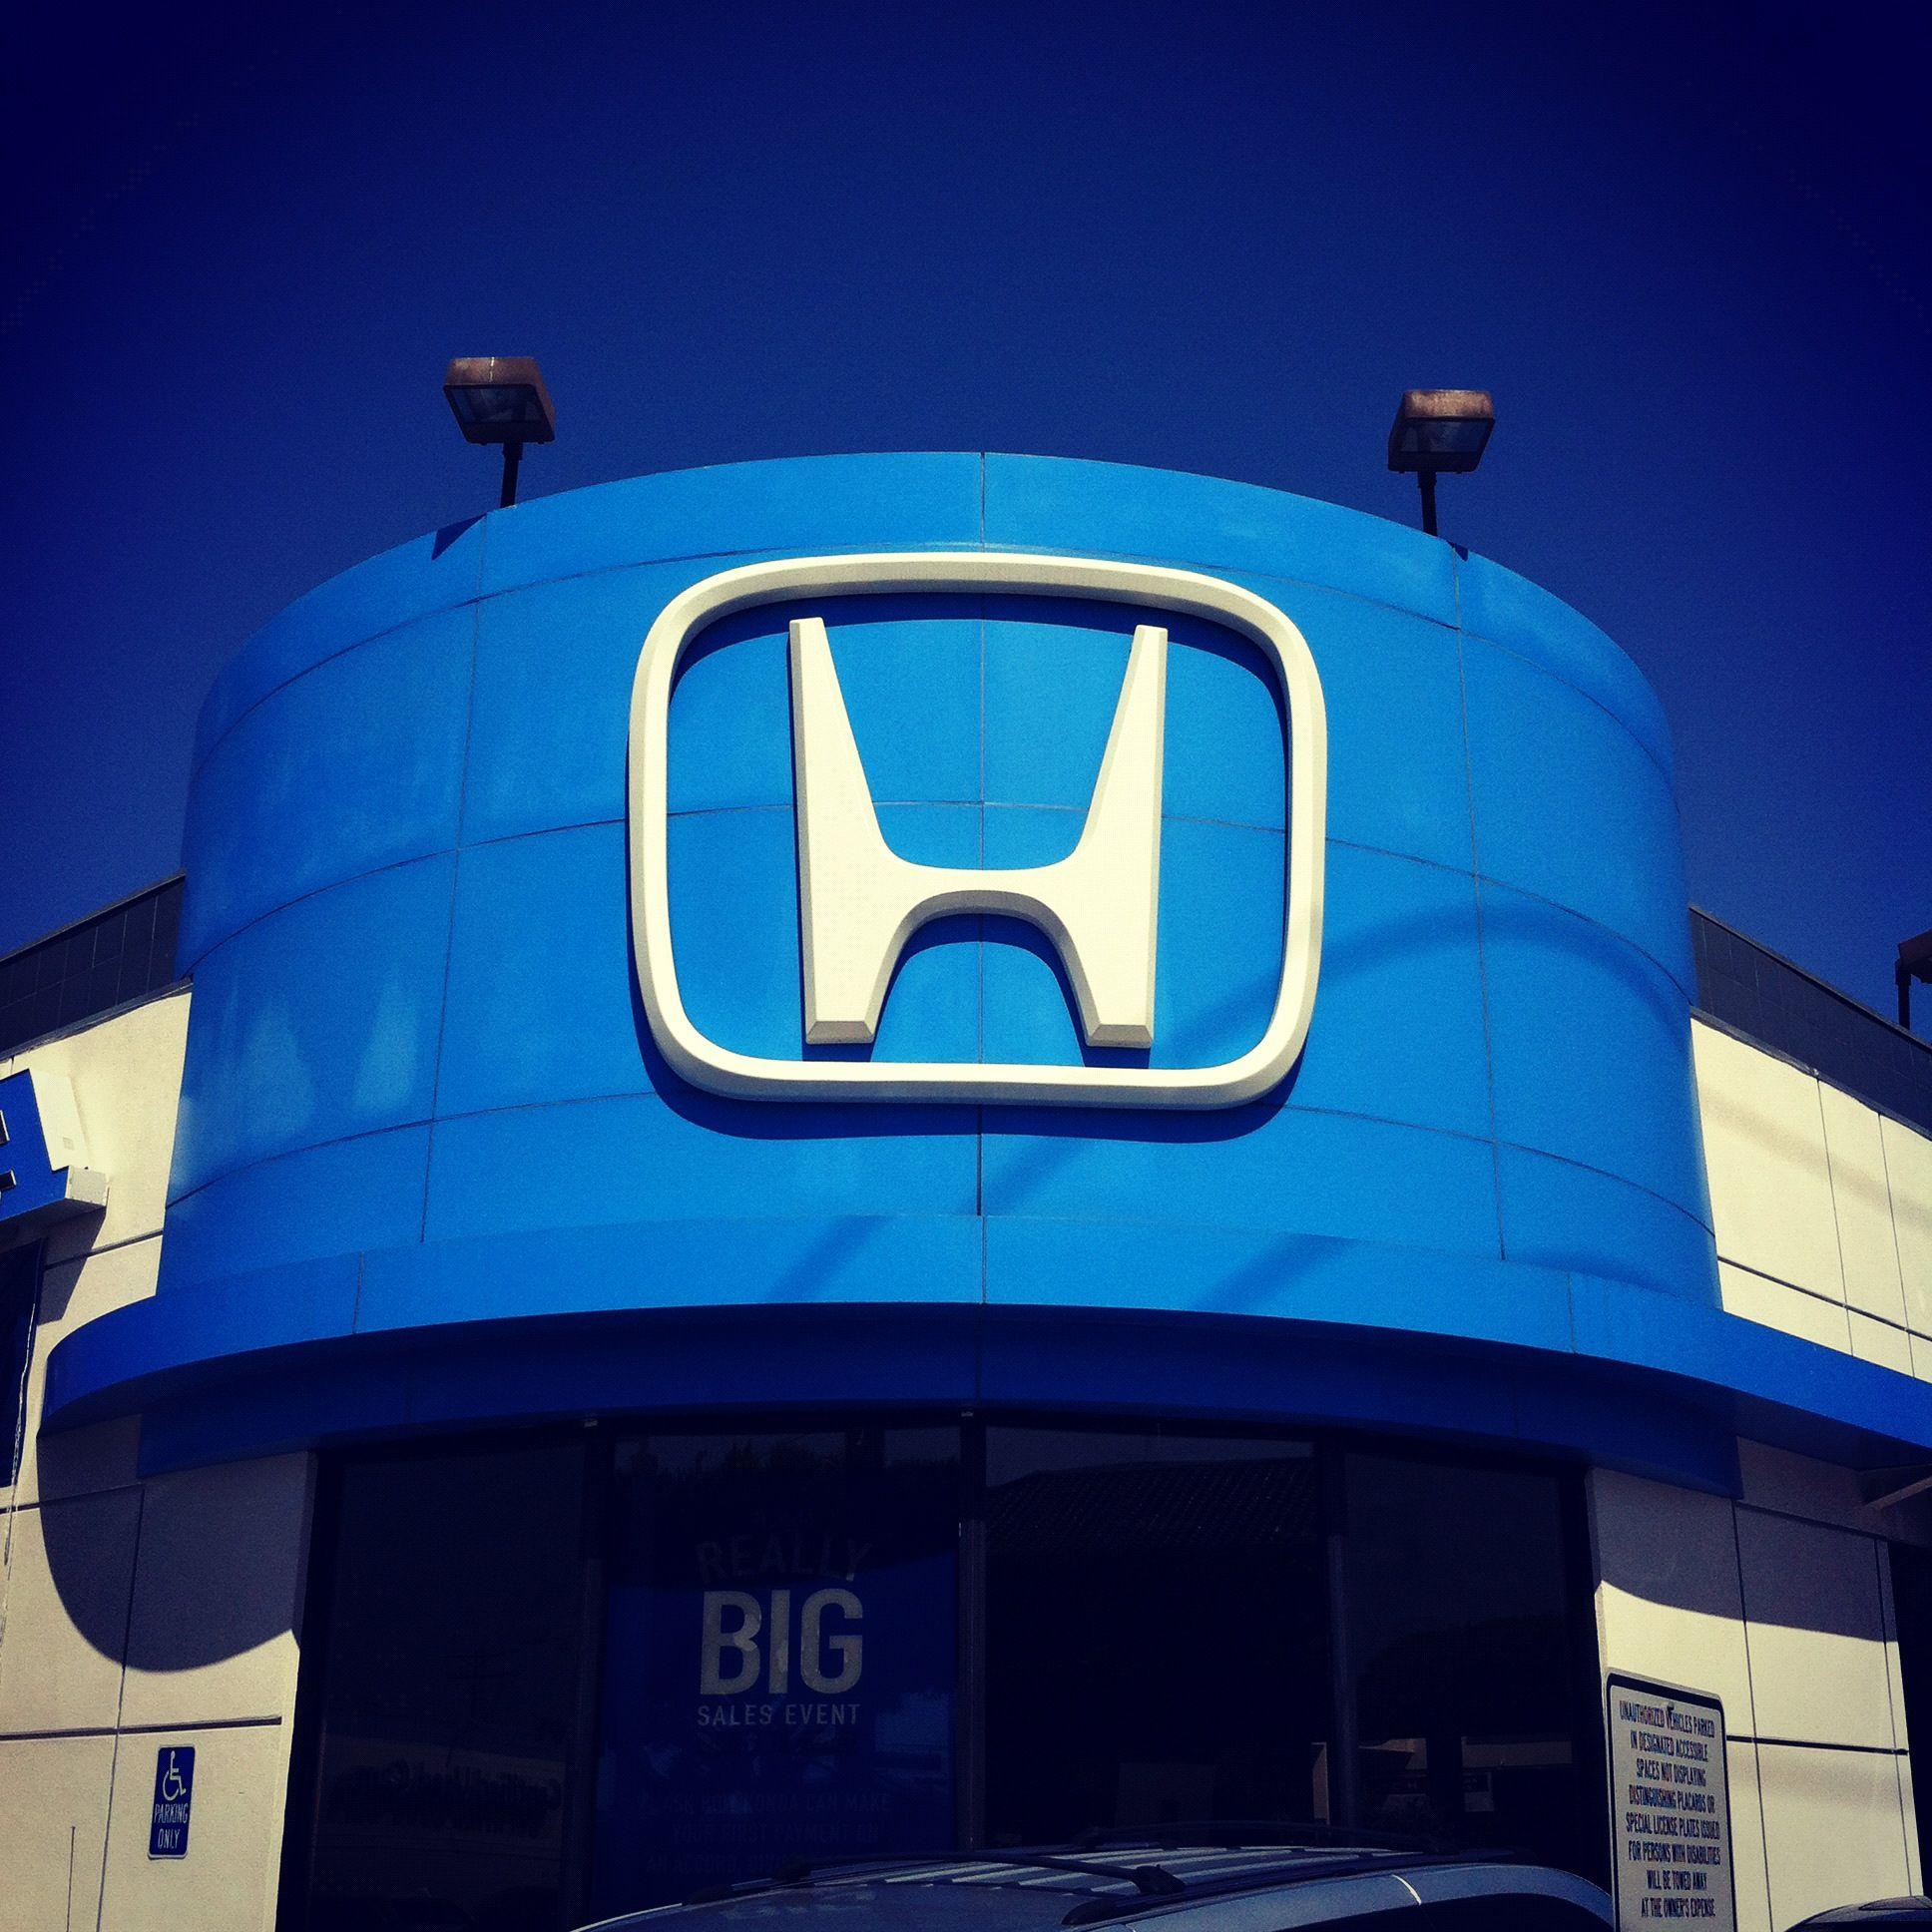 So Cals Premier Honda Dealer In The South Bay Sun Honda Honda Dealership South Bay